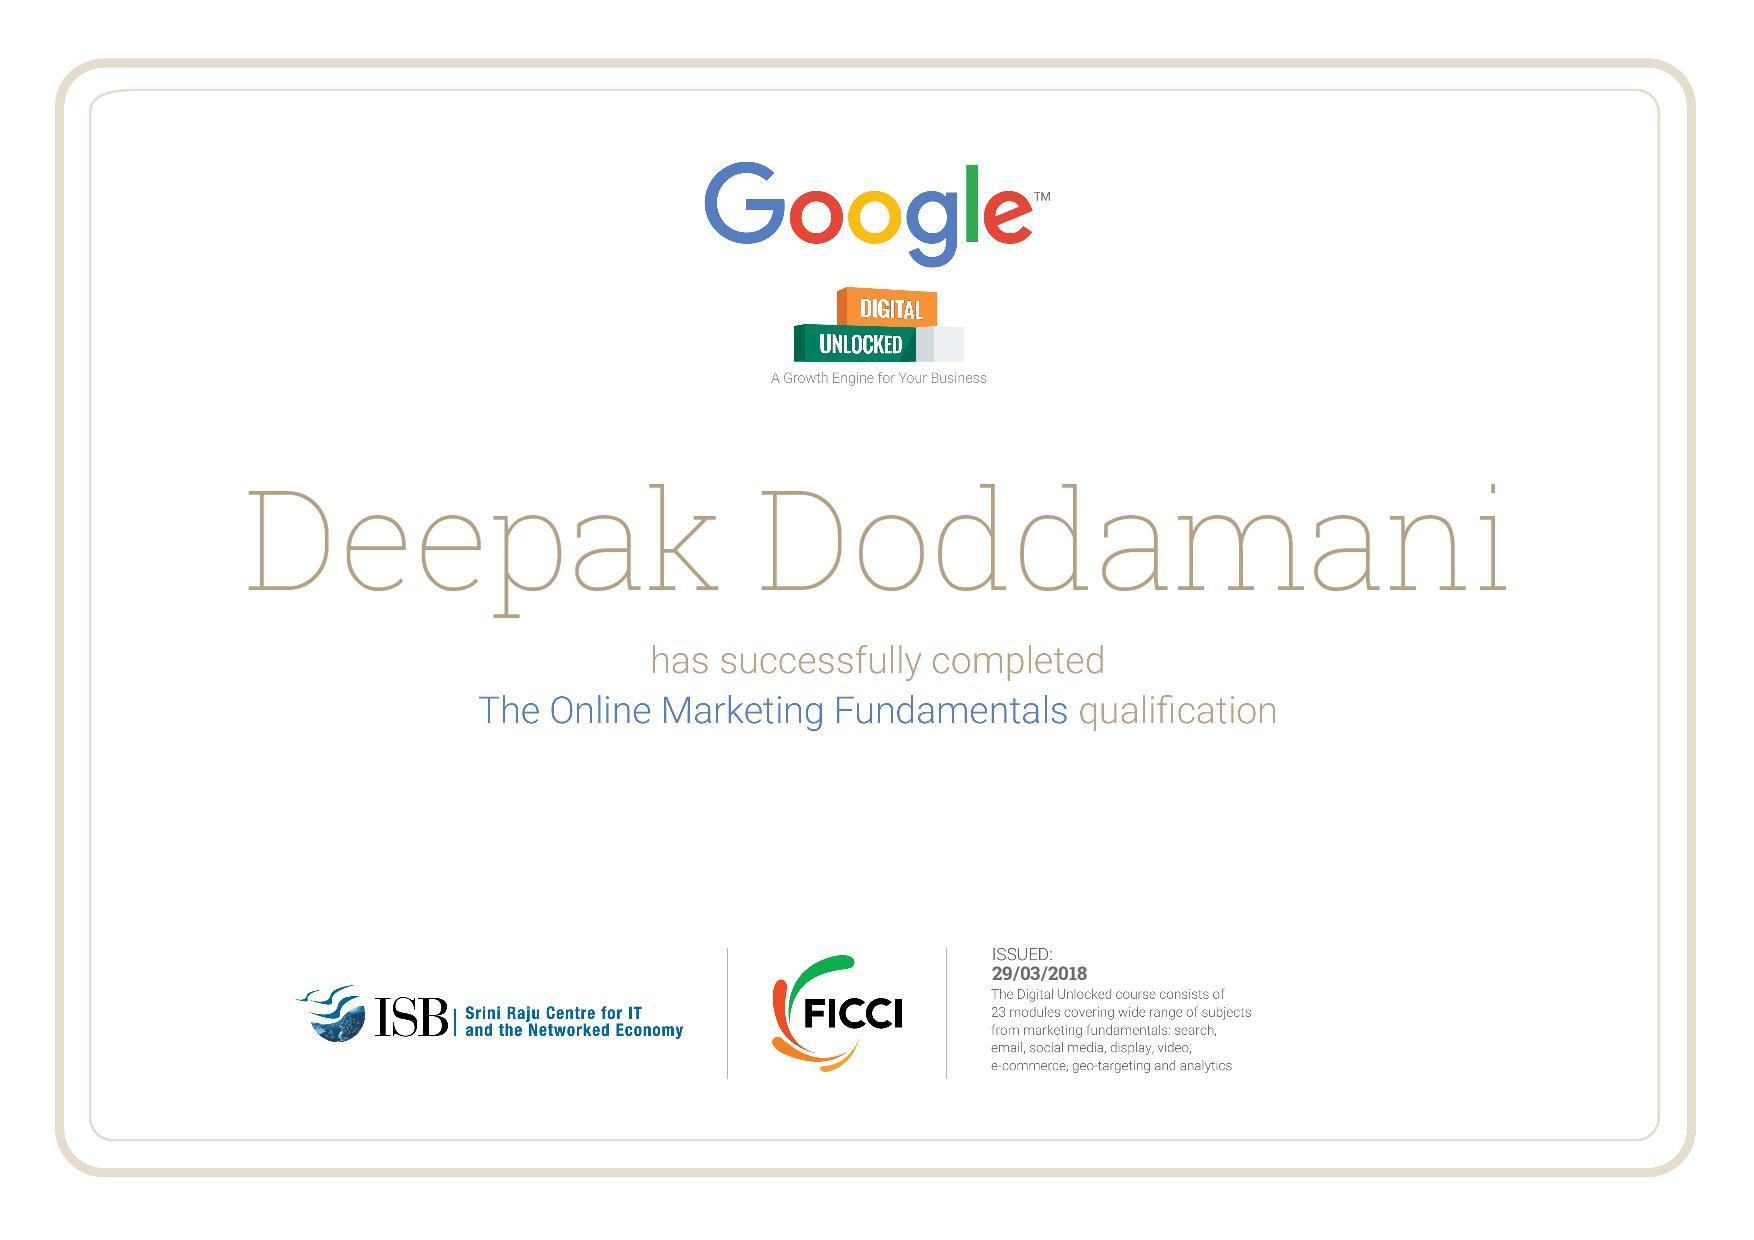 Google's Digital Marketing Certificate of Deepak Doddamani